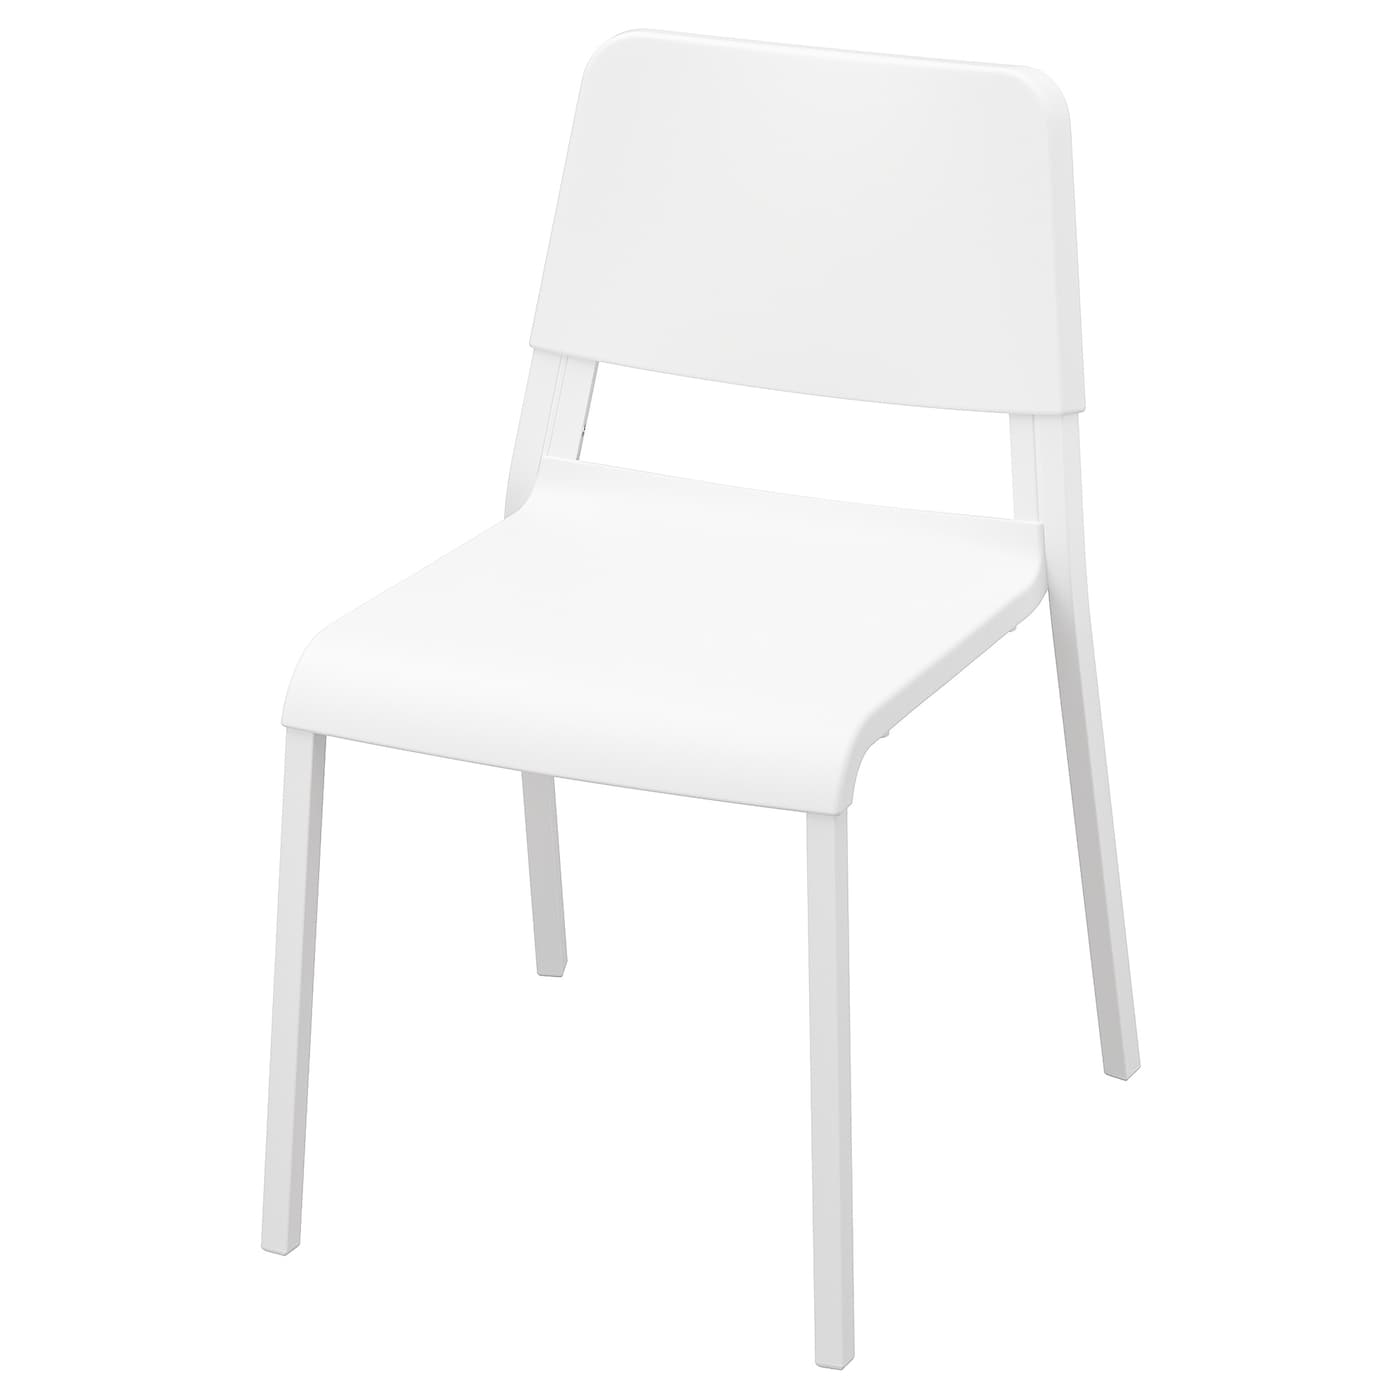 silla de ikea handicap chairs